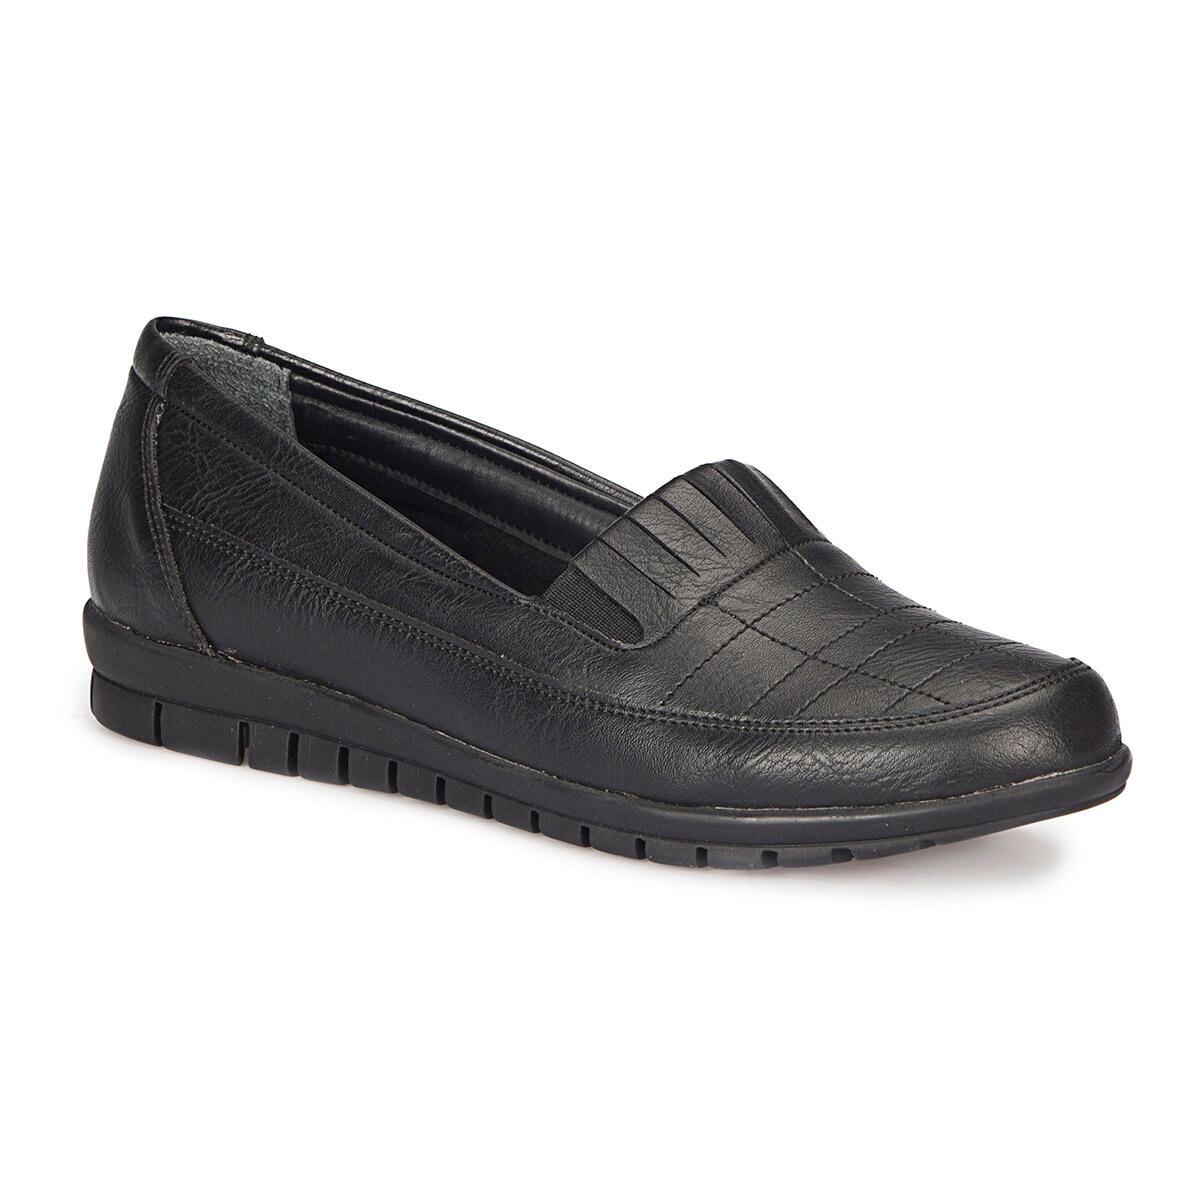 FLO 72.158013.Z Burgundy Women Loafer Shoes Polaris